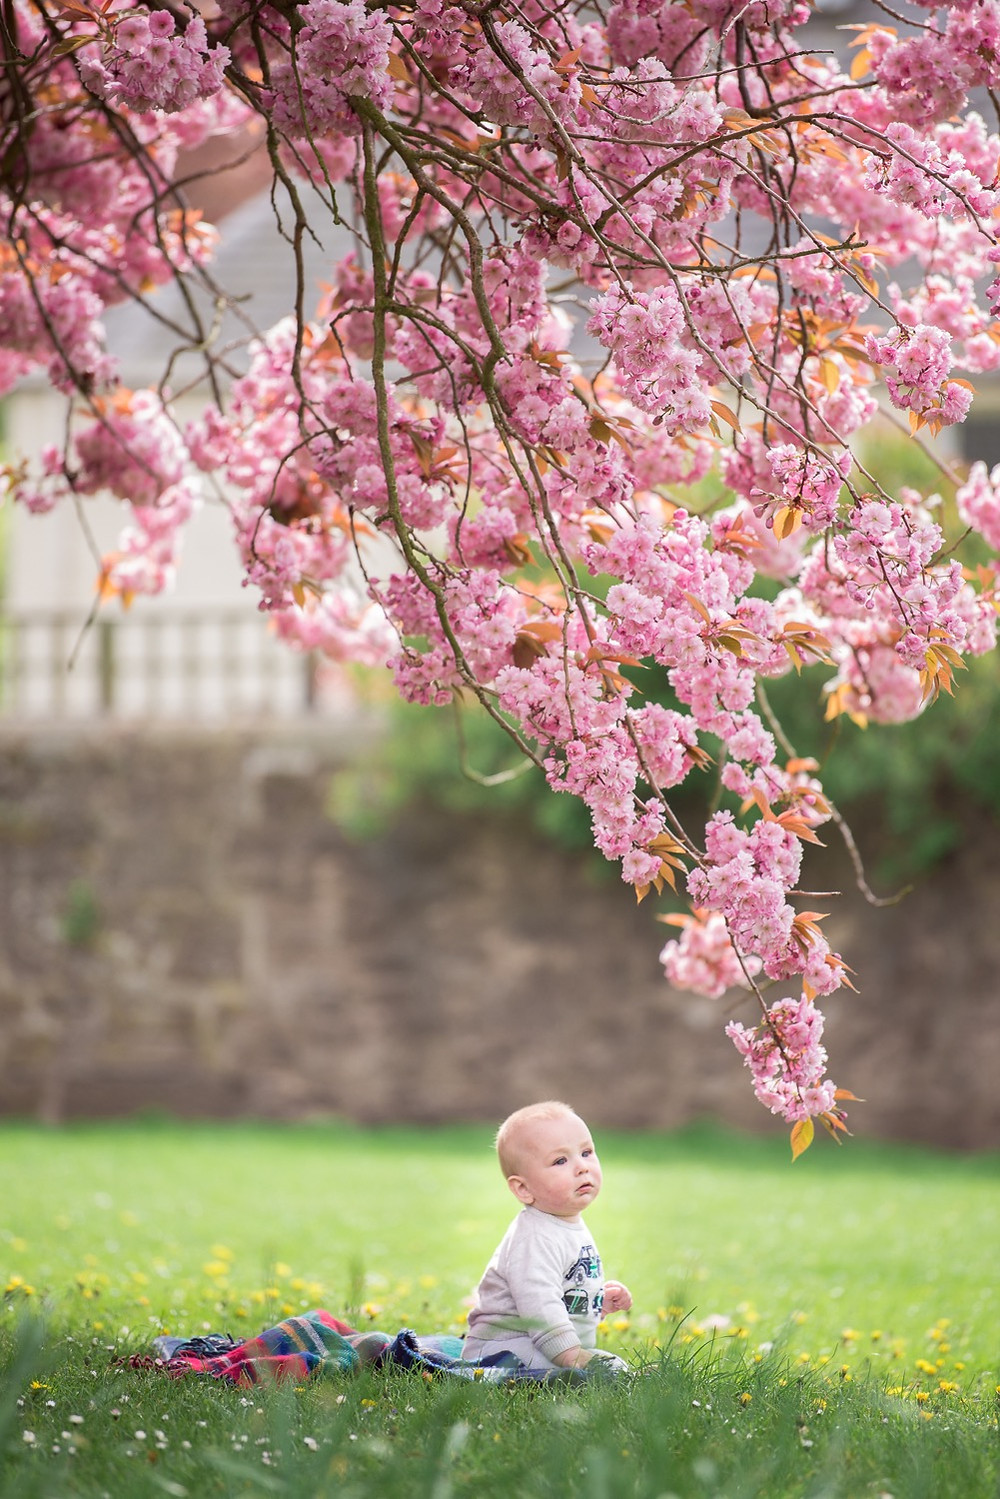 dundee-family-photography-boy-under-cherryblossom-tree-dawson-park